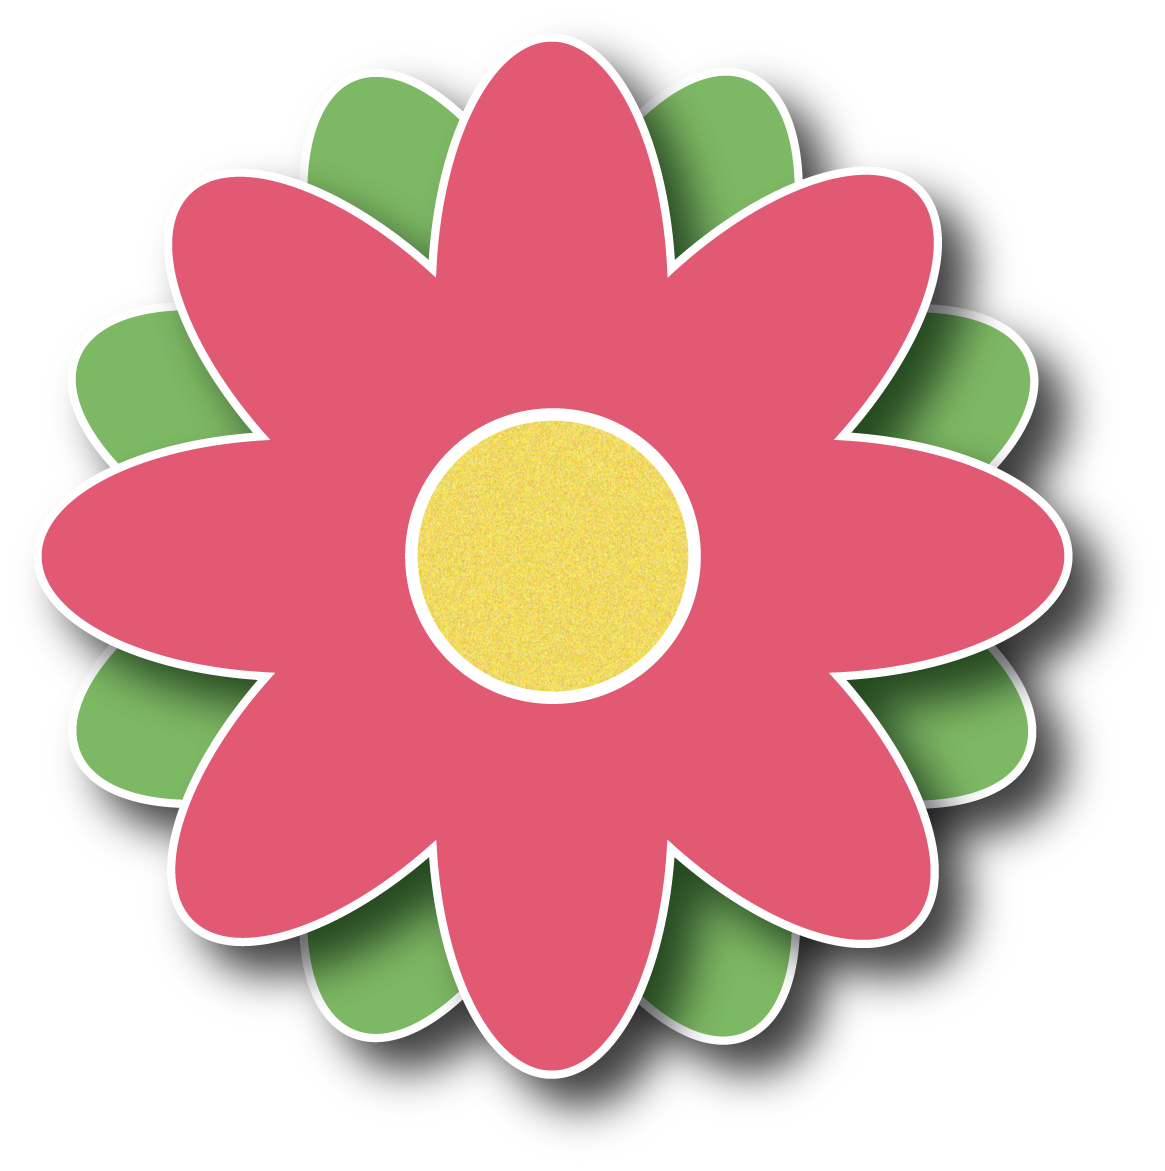 1165x1171 Flowers Free Flower Clip Art